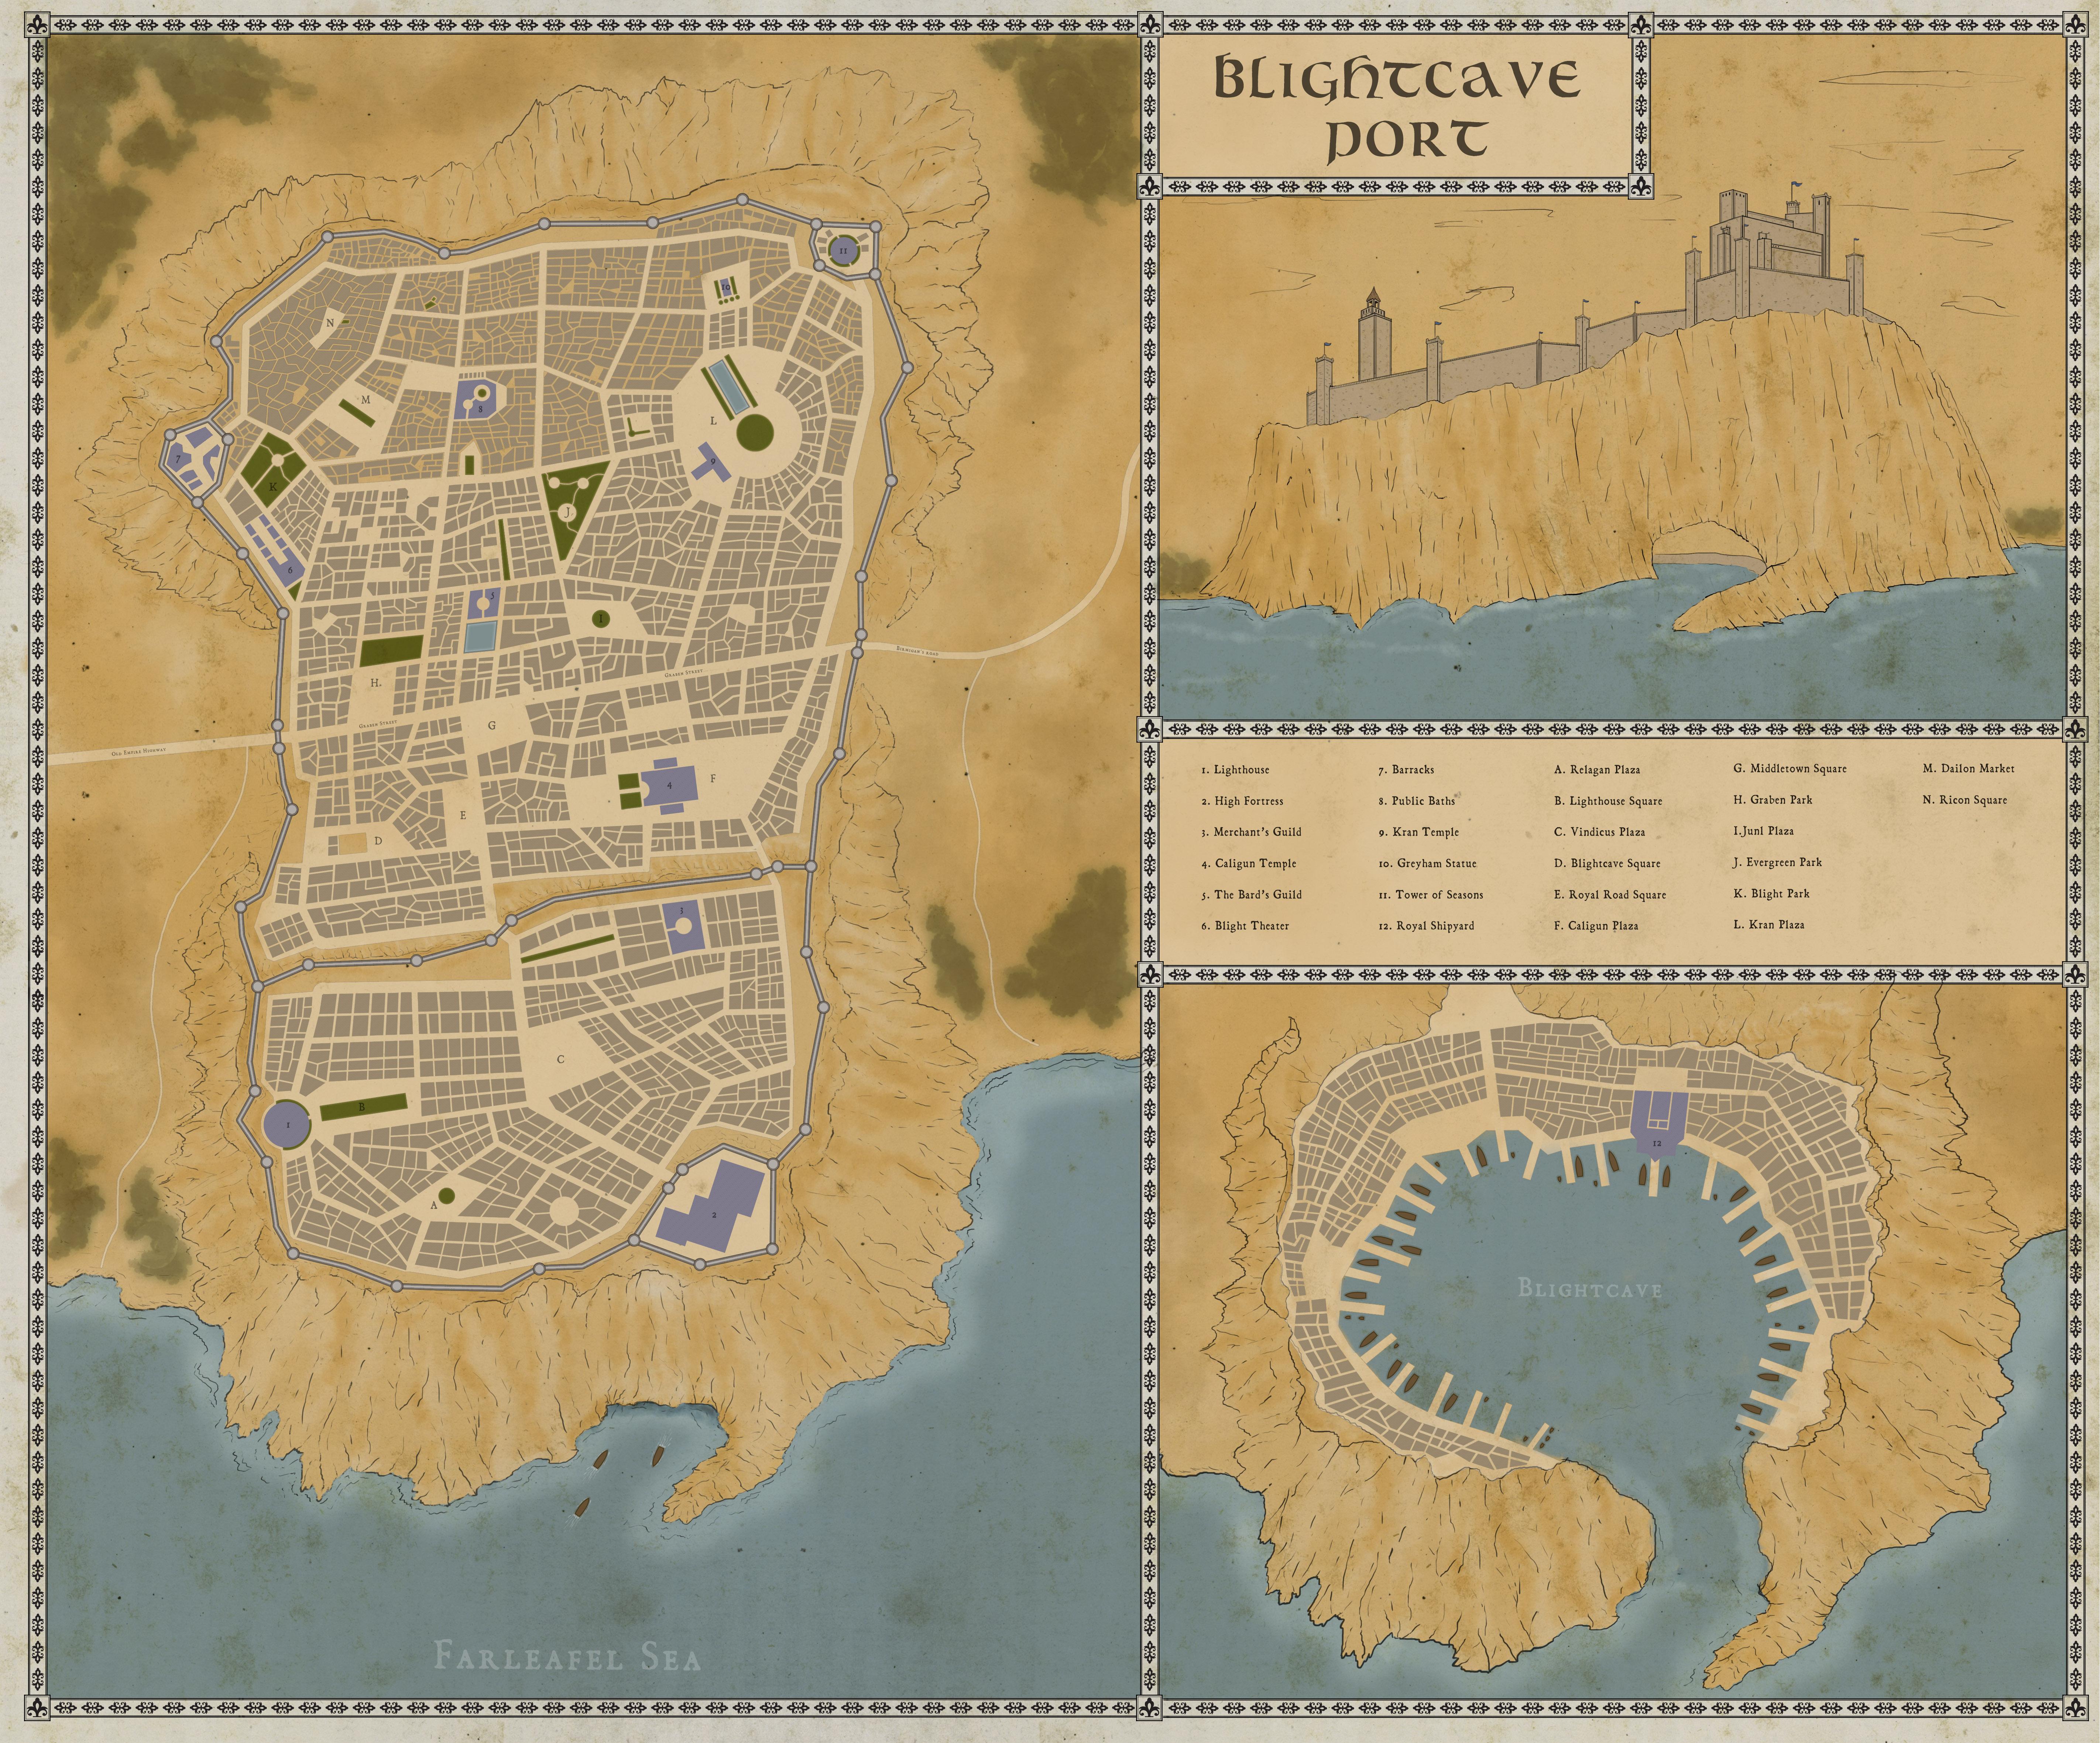 Blightcave Port by felipecarbus